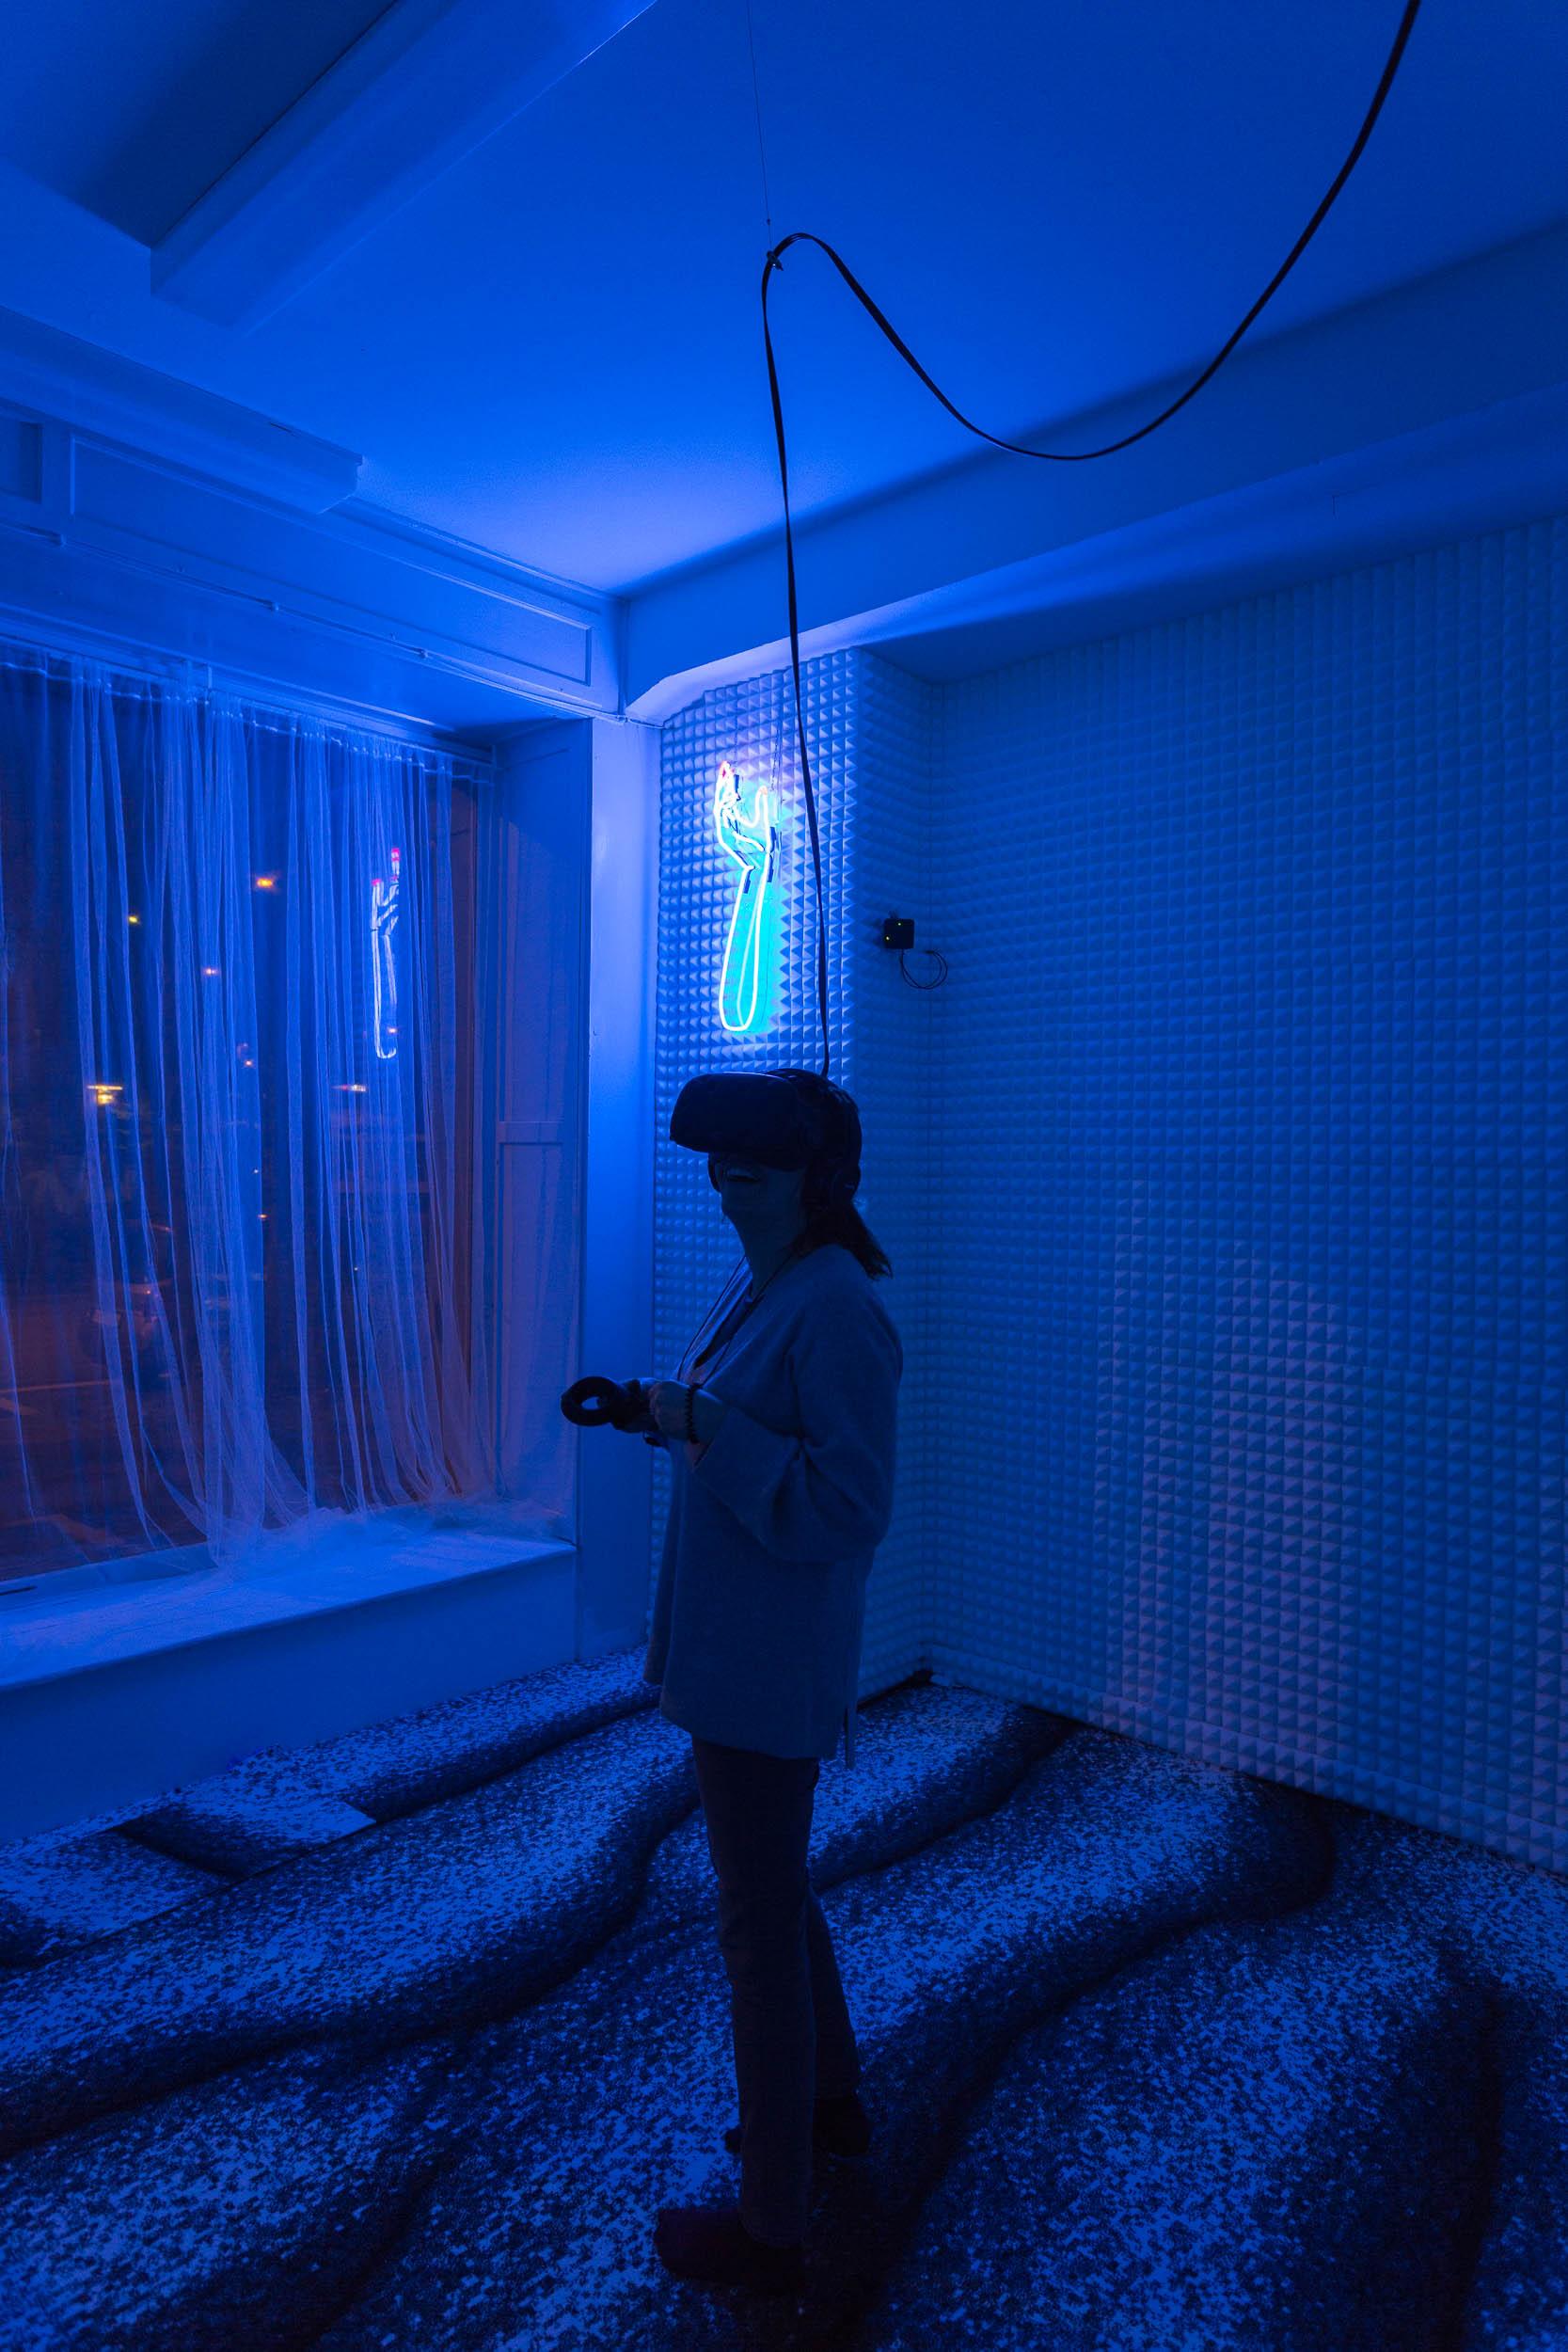 Mélodie Mousset,  HanaHana , 2016-2018, Virtual Reality Experience, Room Installation, Neon, dimension variable  Photo: Kilian Bannwart